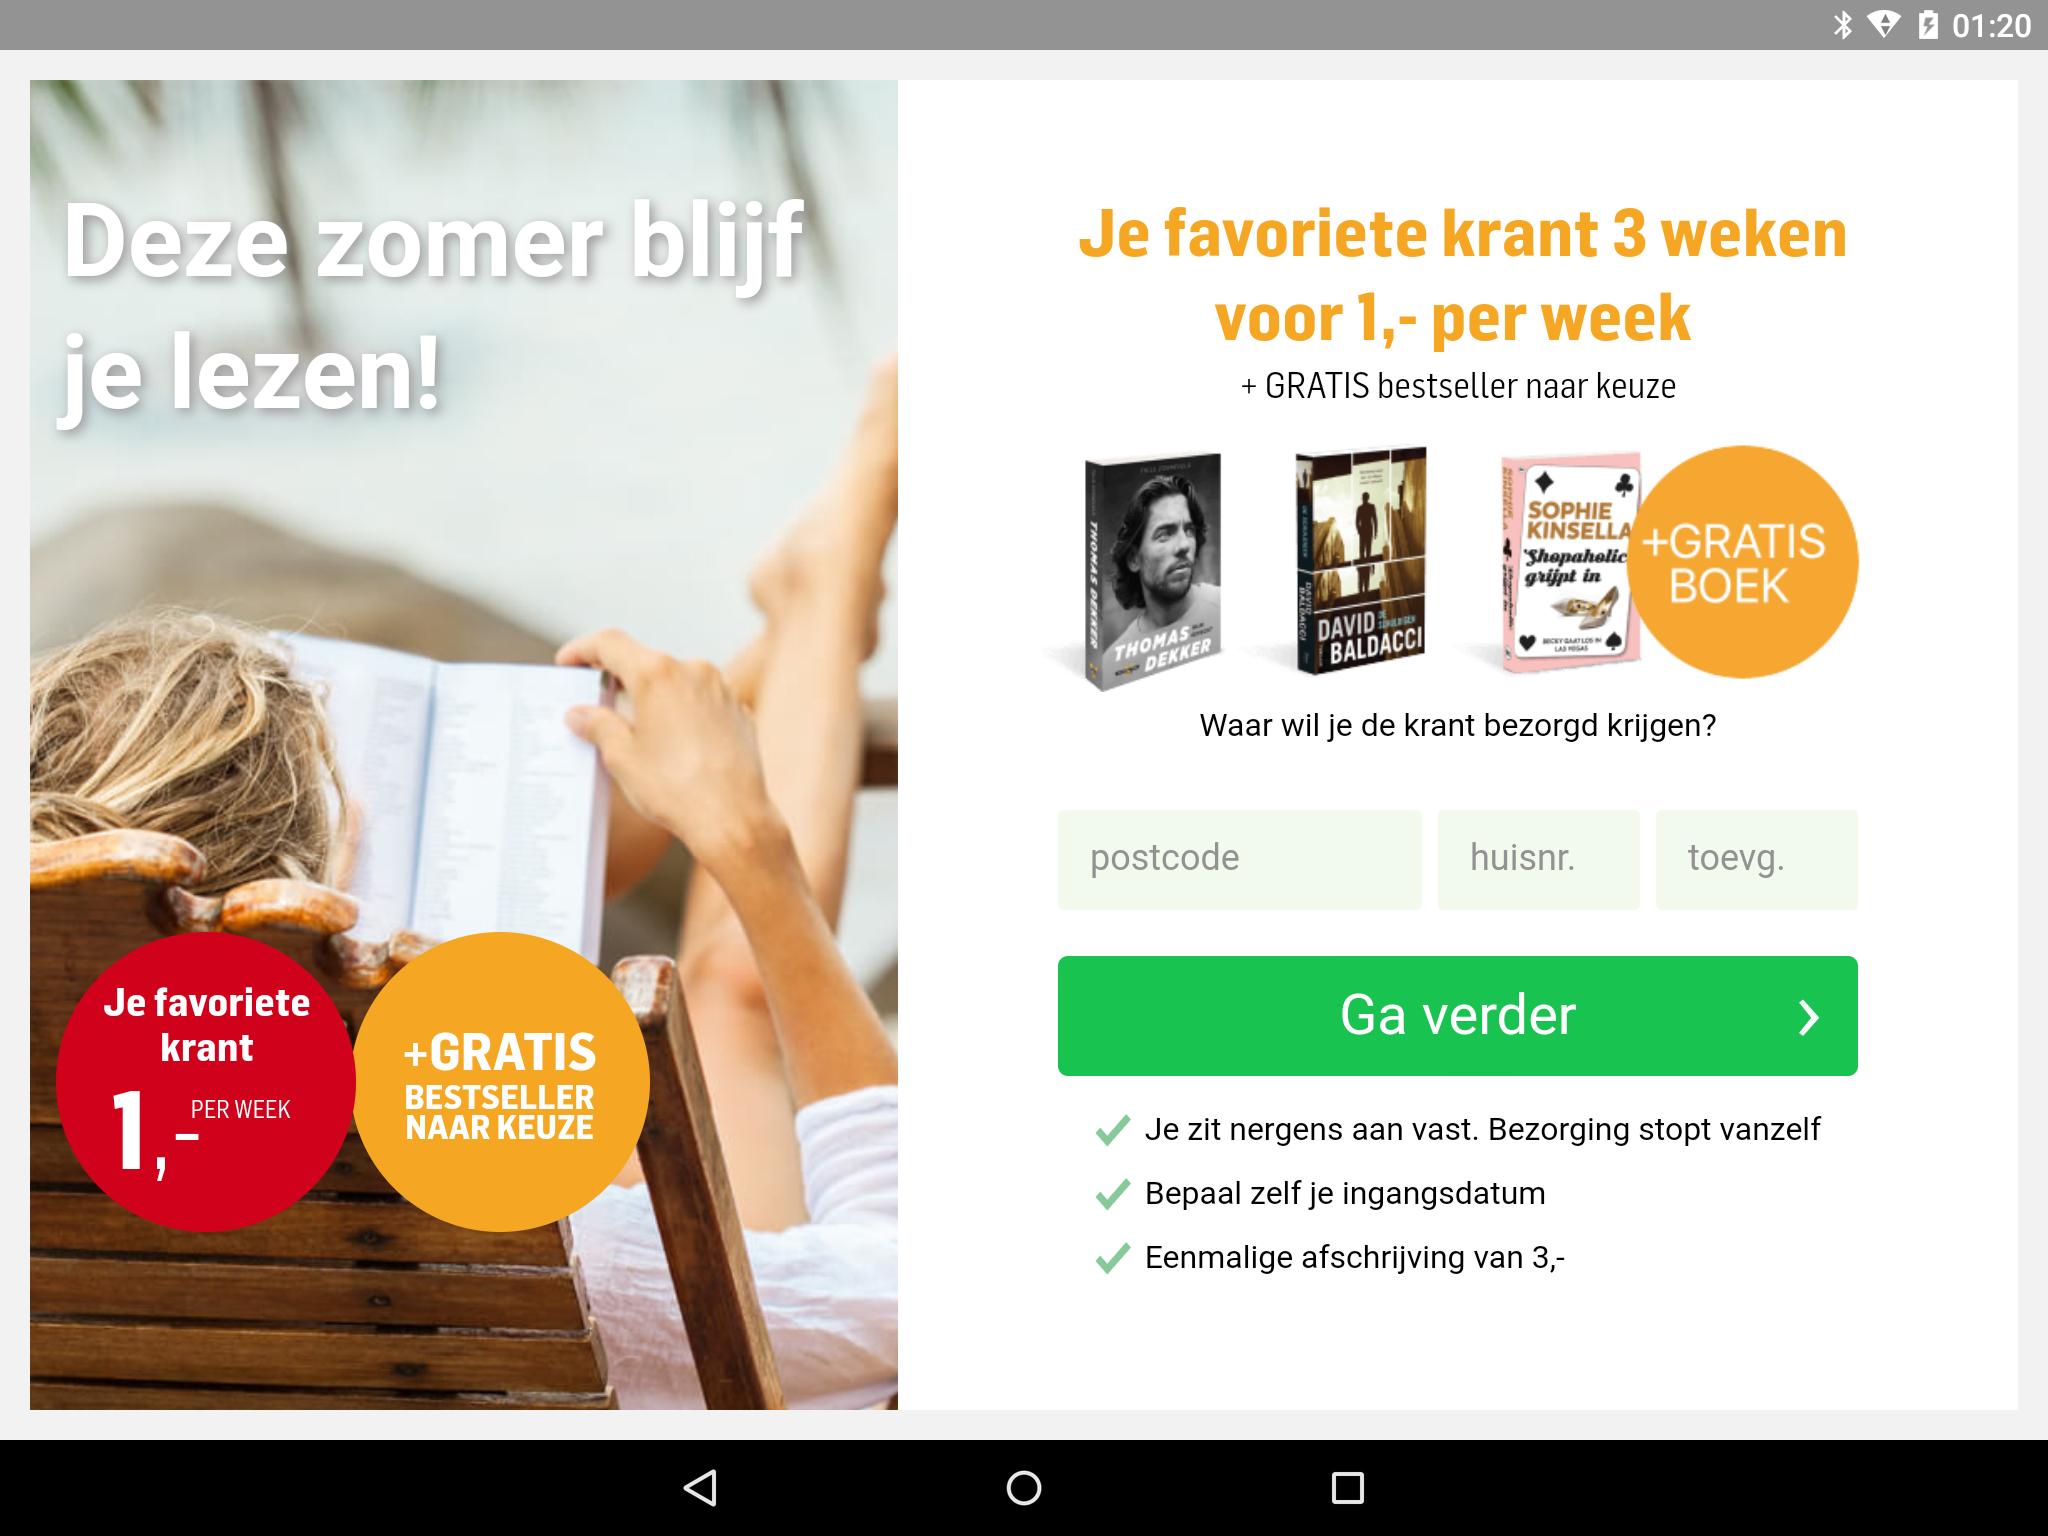 3 weken krant + gratis boek, 3 euro @krant.nl